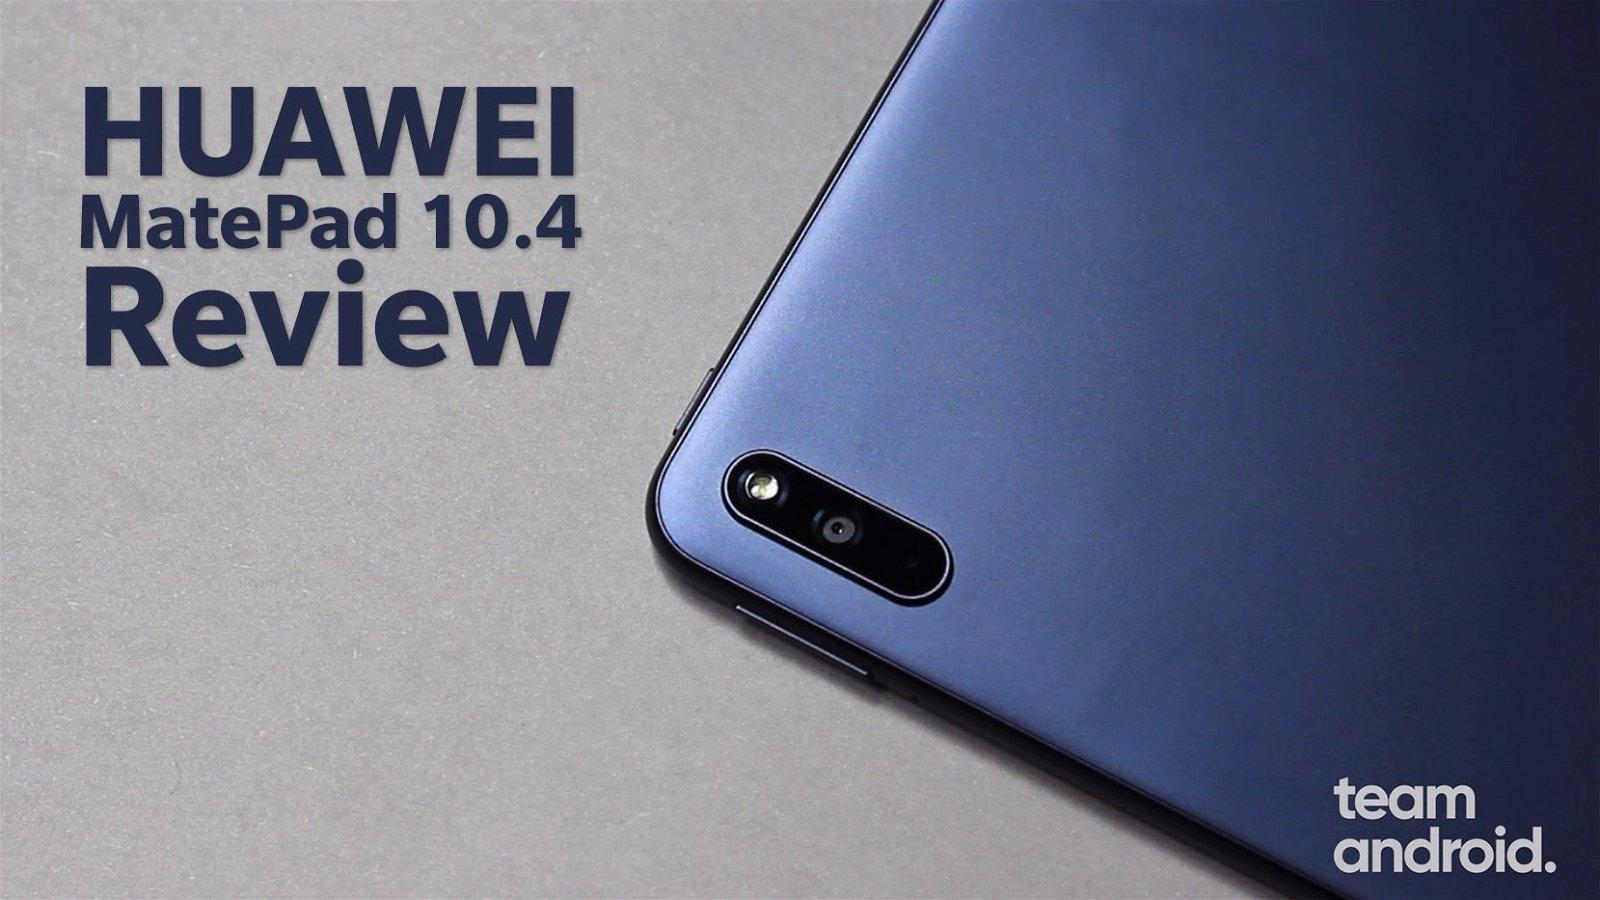 Huawei MatePad 10.4 Review 5